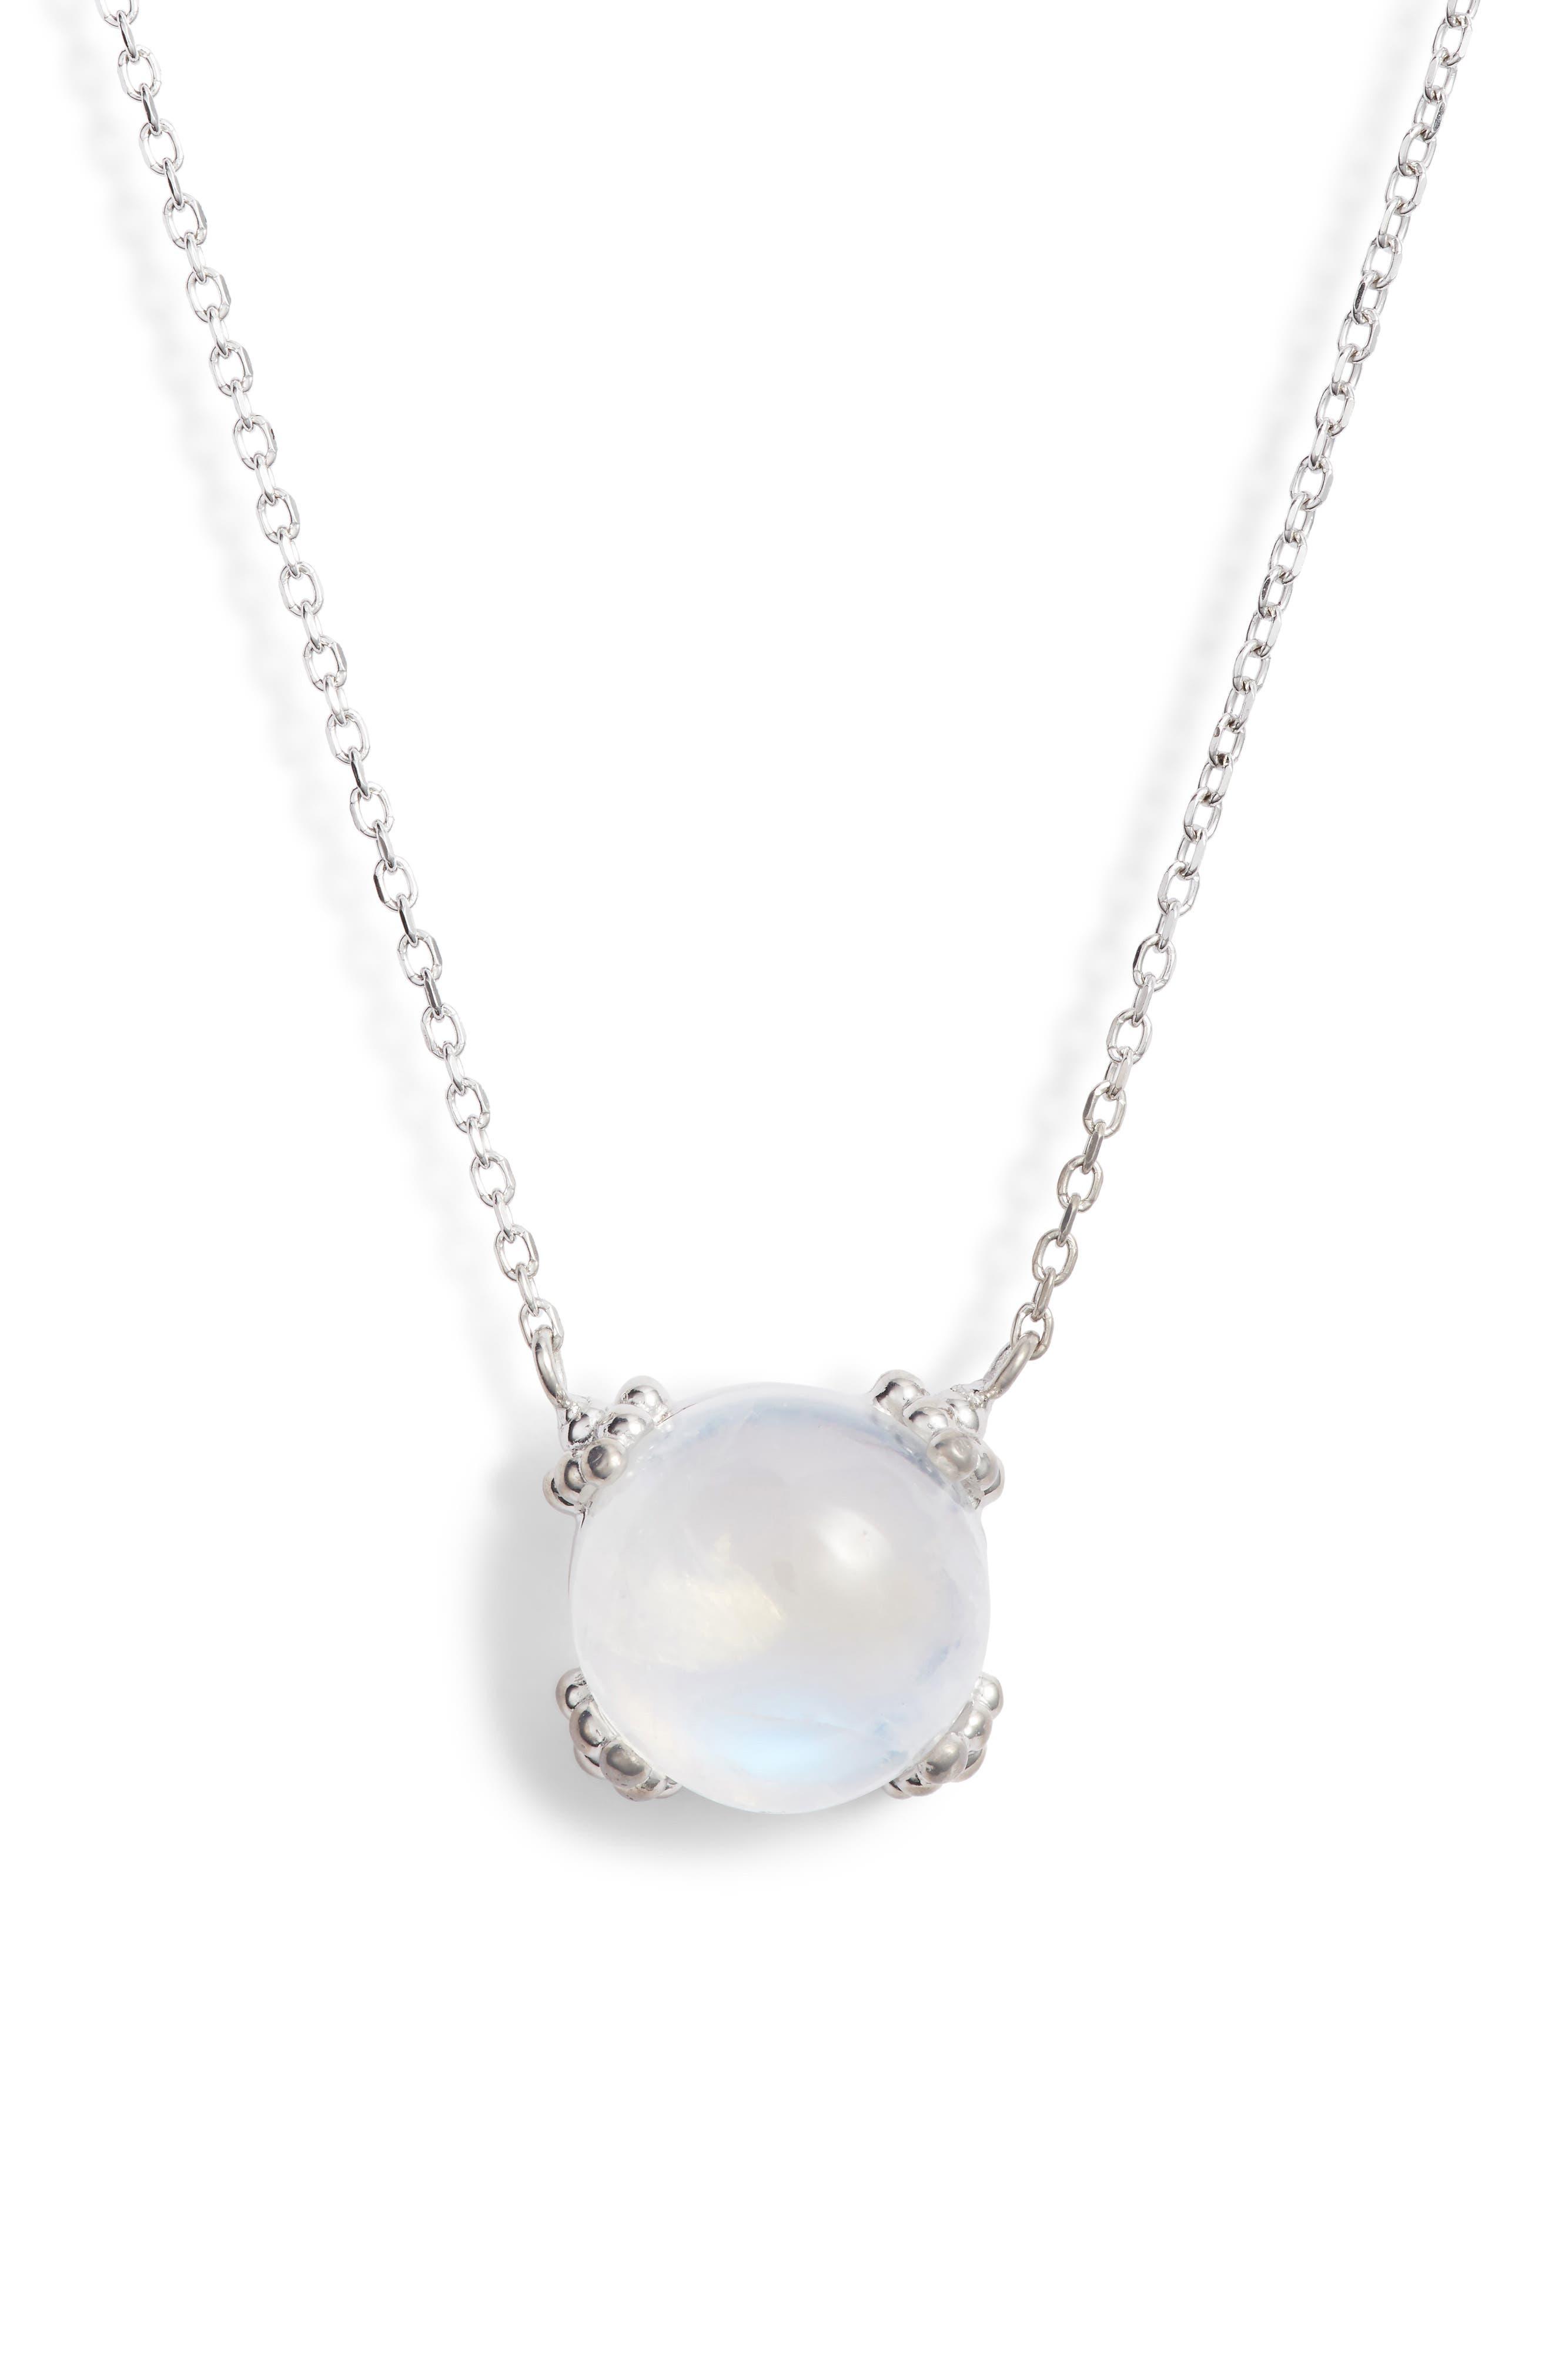 Dew Drop Cluster Moonstone Pendant Necklace,                             Main thumbnail 1, color,                             SILVER